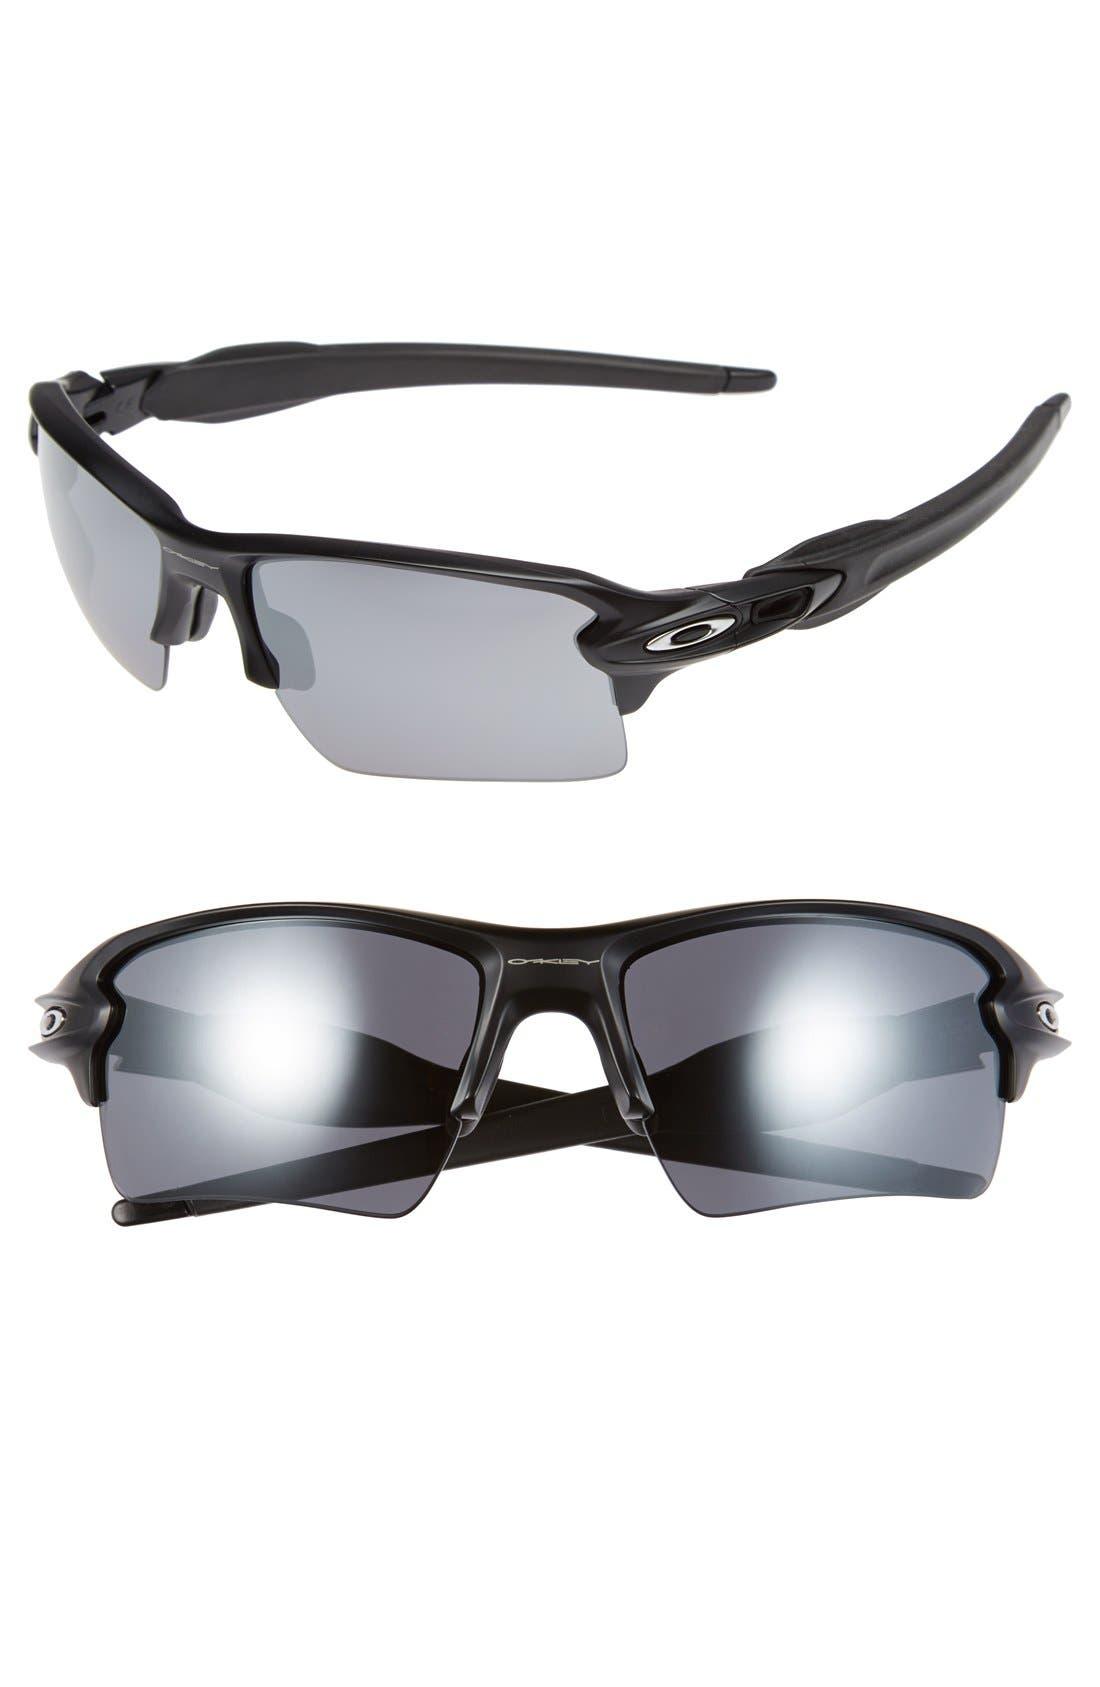 'Flak 2.0 XL' 59mm Sunglasses,                             Main thumbnail 1, color,                             Matte Black/ Black Iridium